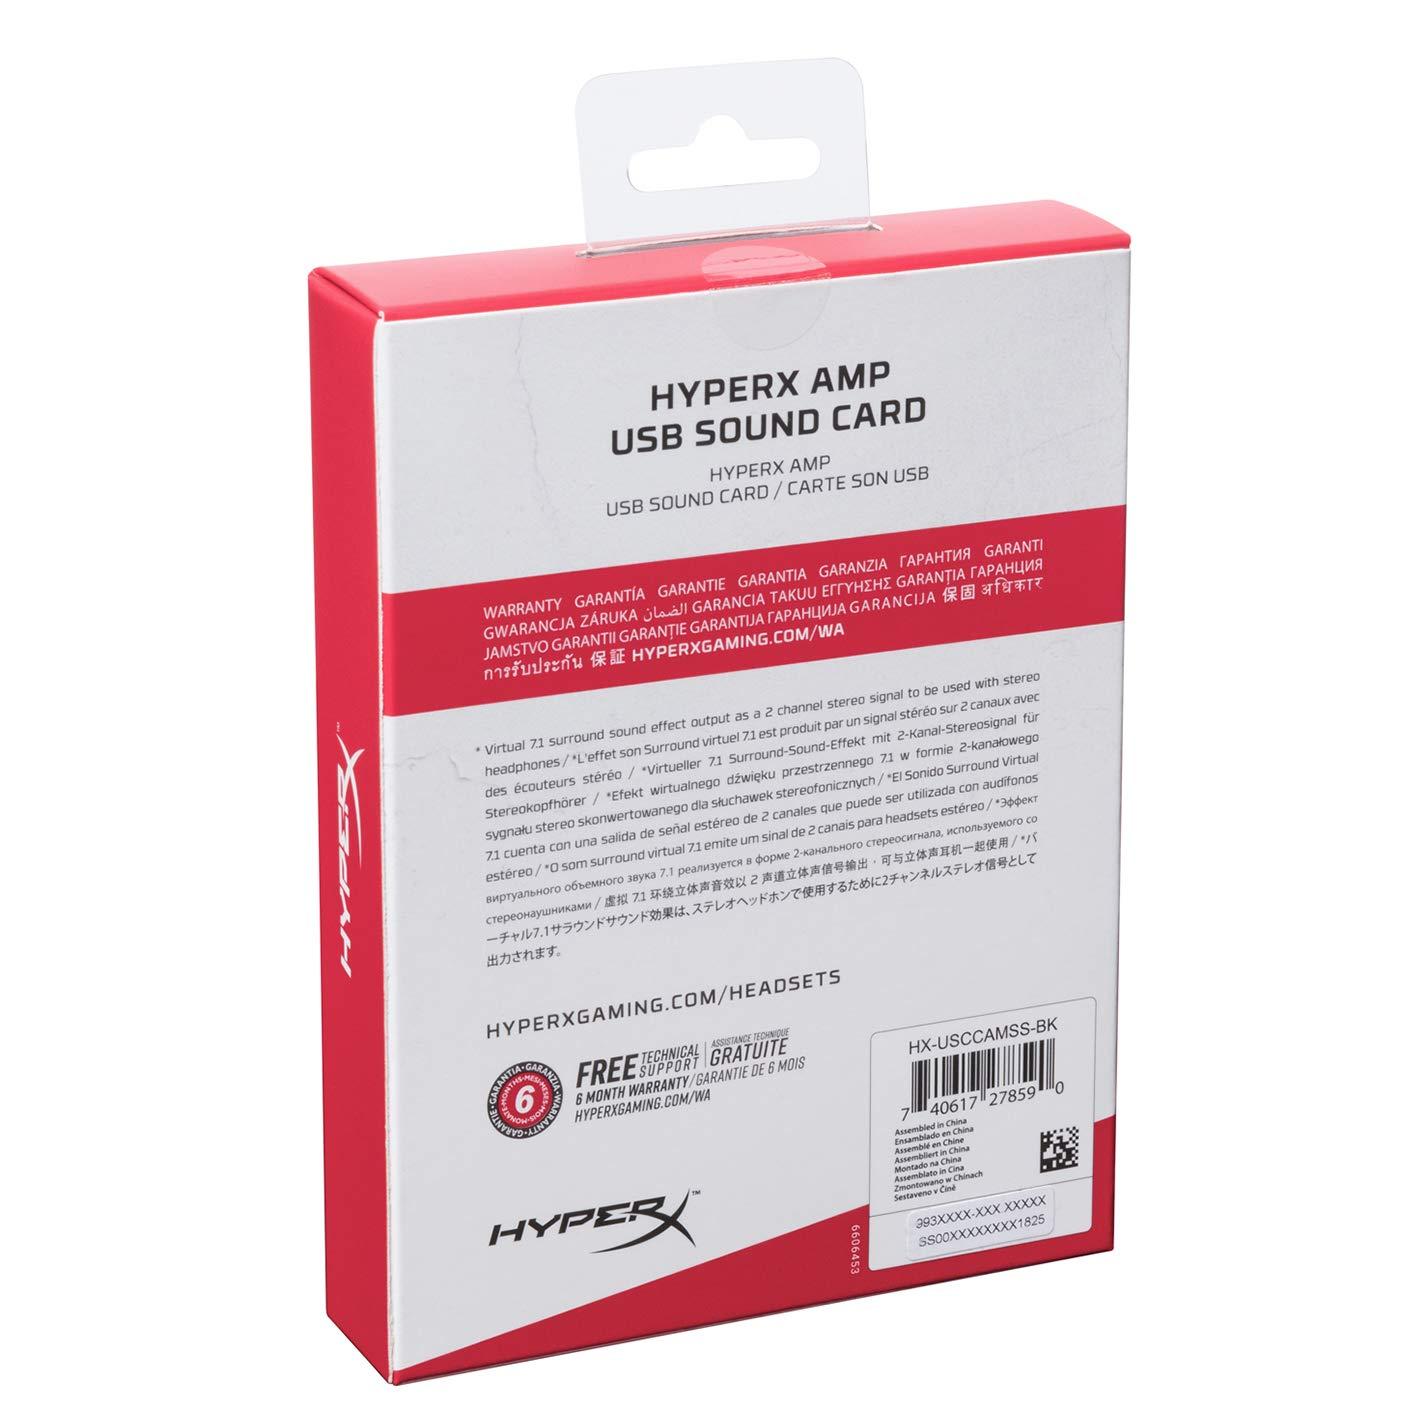 HyperX Accessories AMP USB Sound Card ของแท้ ประกันศูนย์ 2ปี